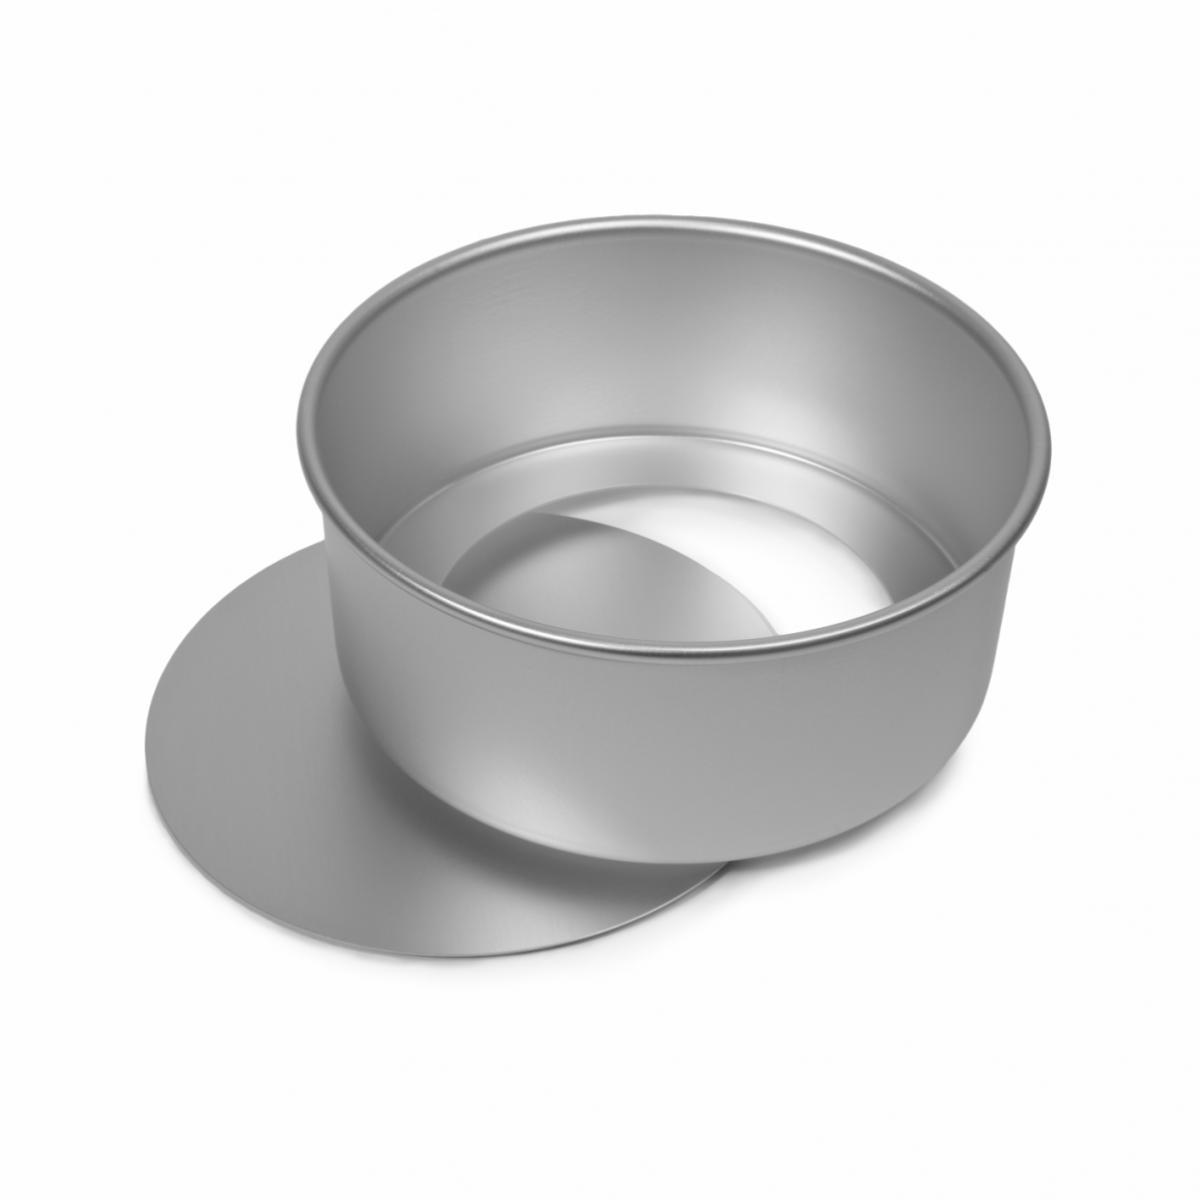 Round To Square Cake Tin Conversion